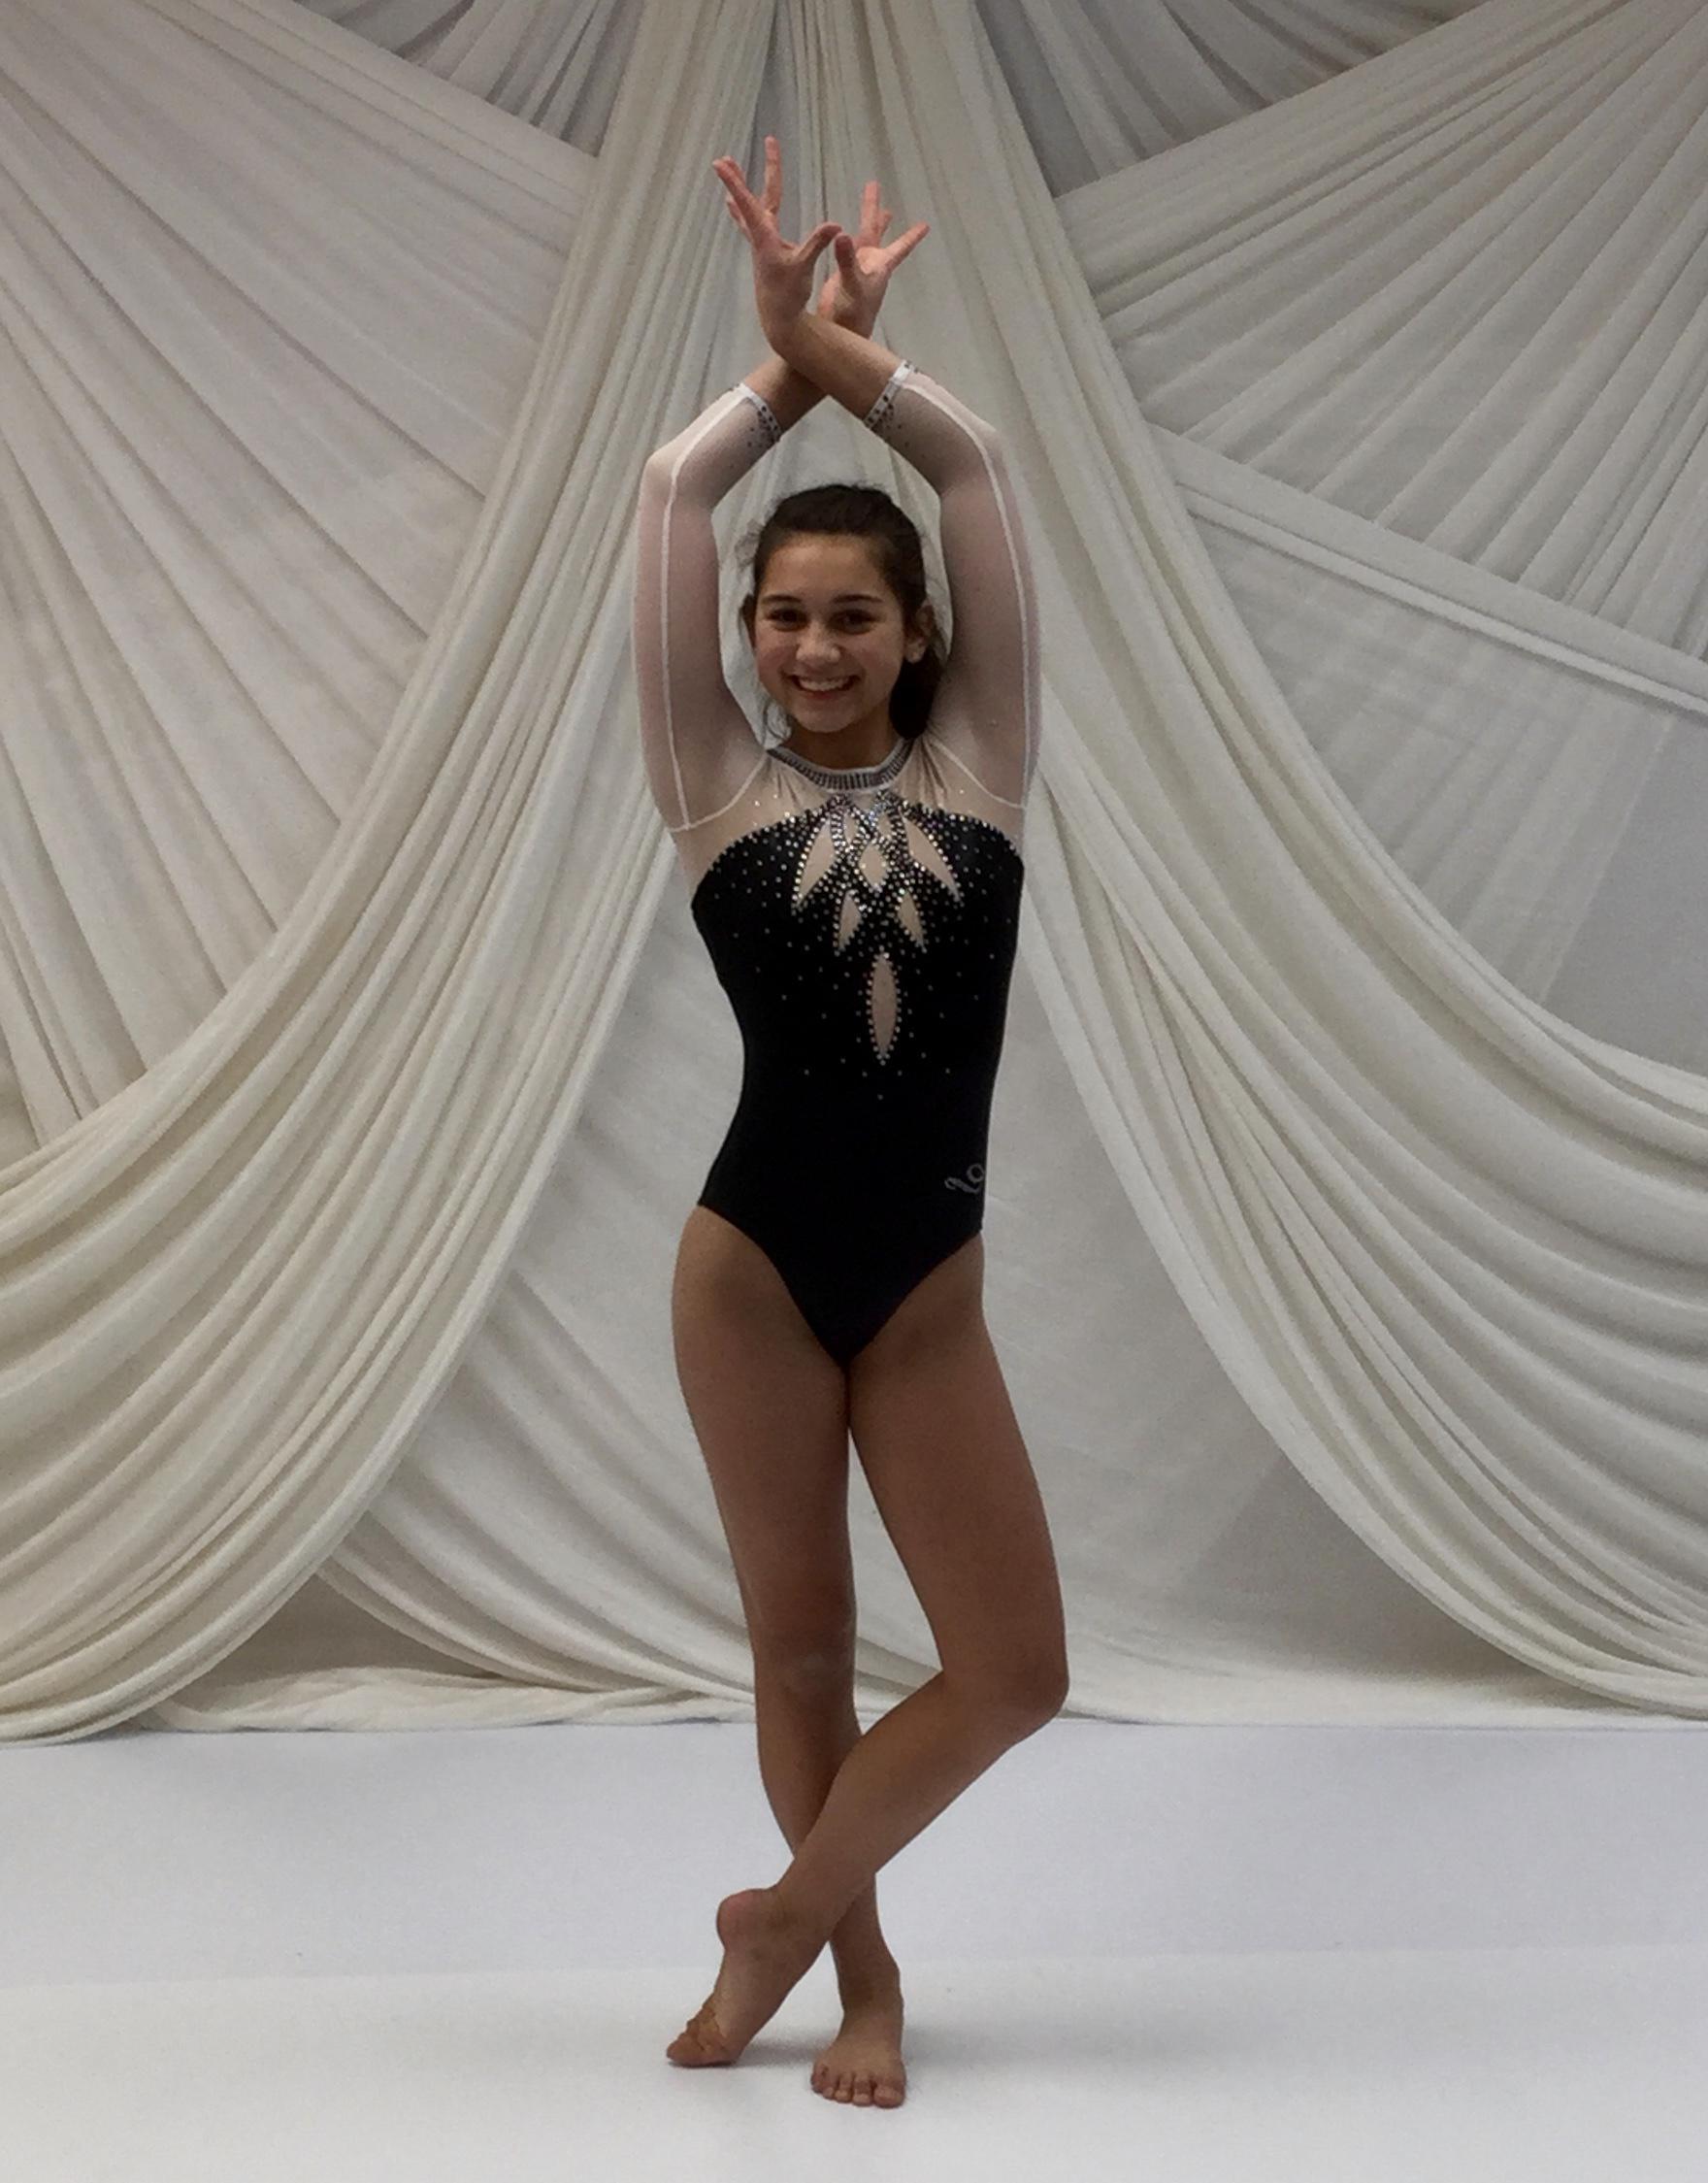 Emma Flips Gymnastics